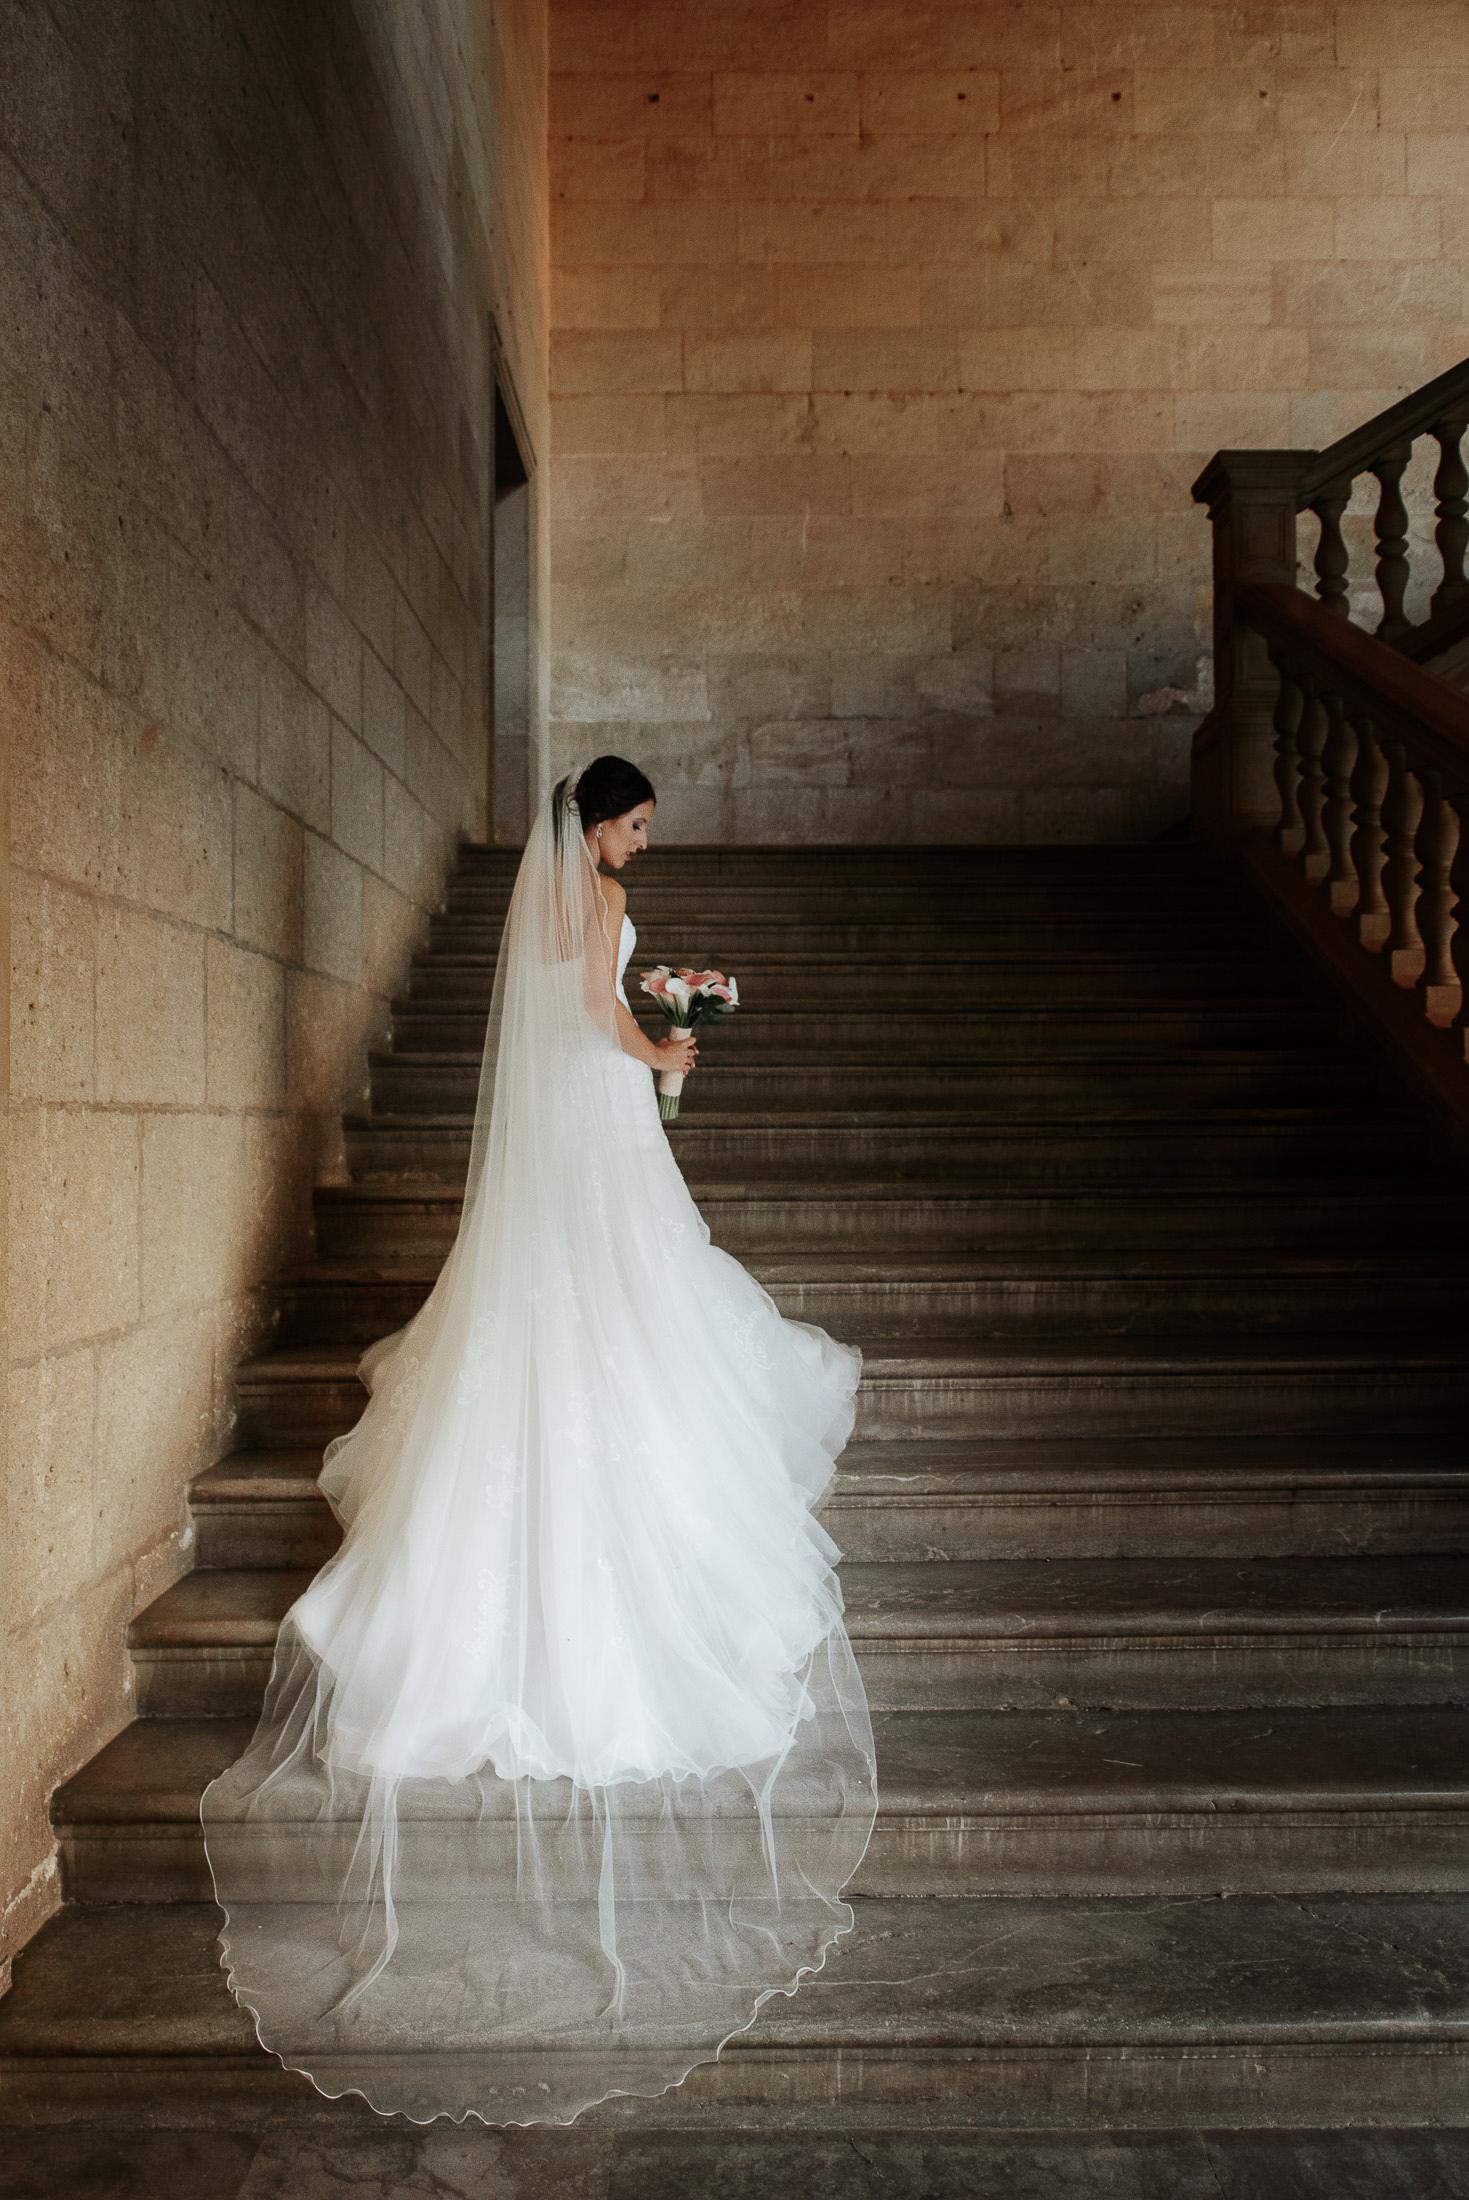 Alhambra Wedding - Bride at the Palace of Charles V